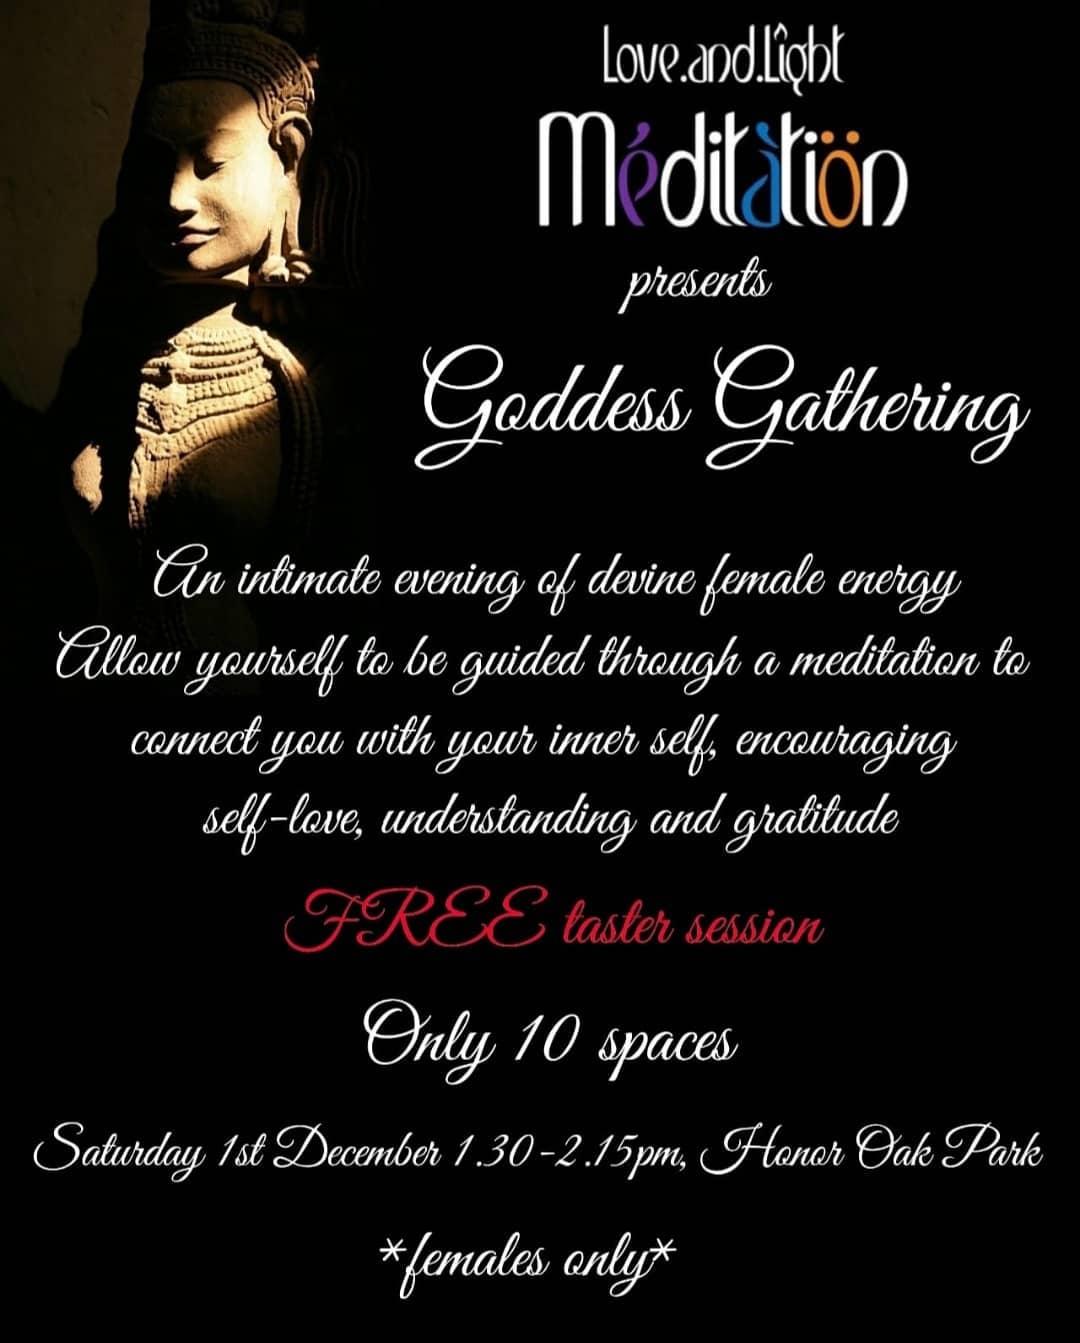 Goddess Gathering